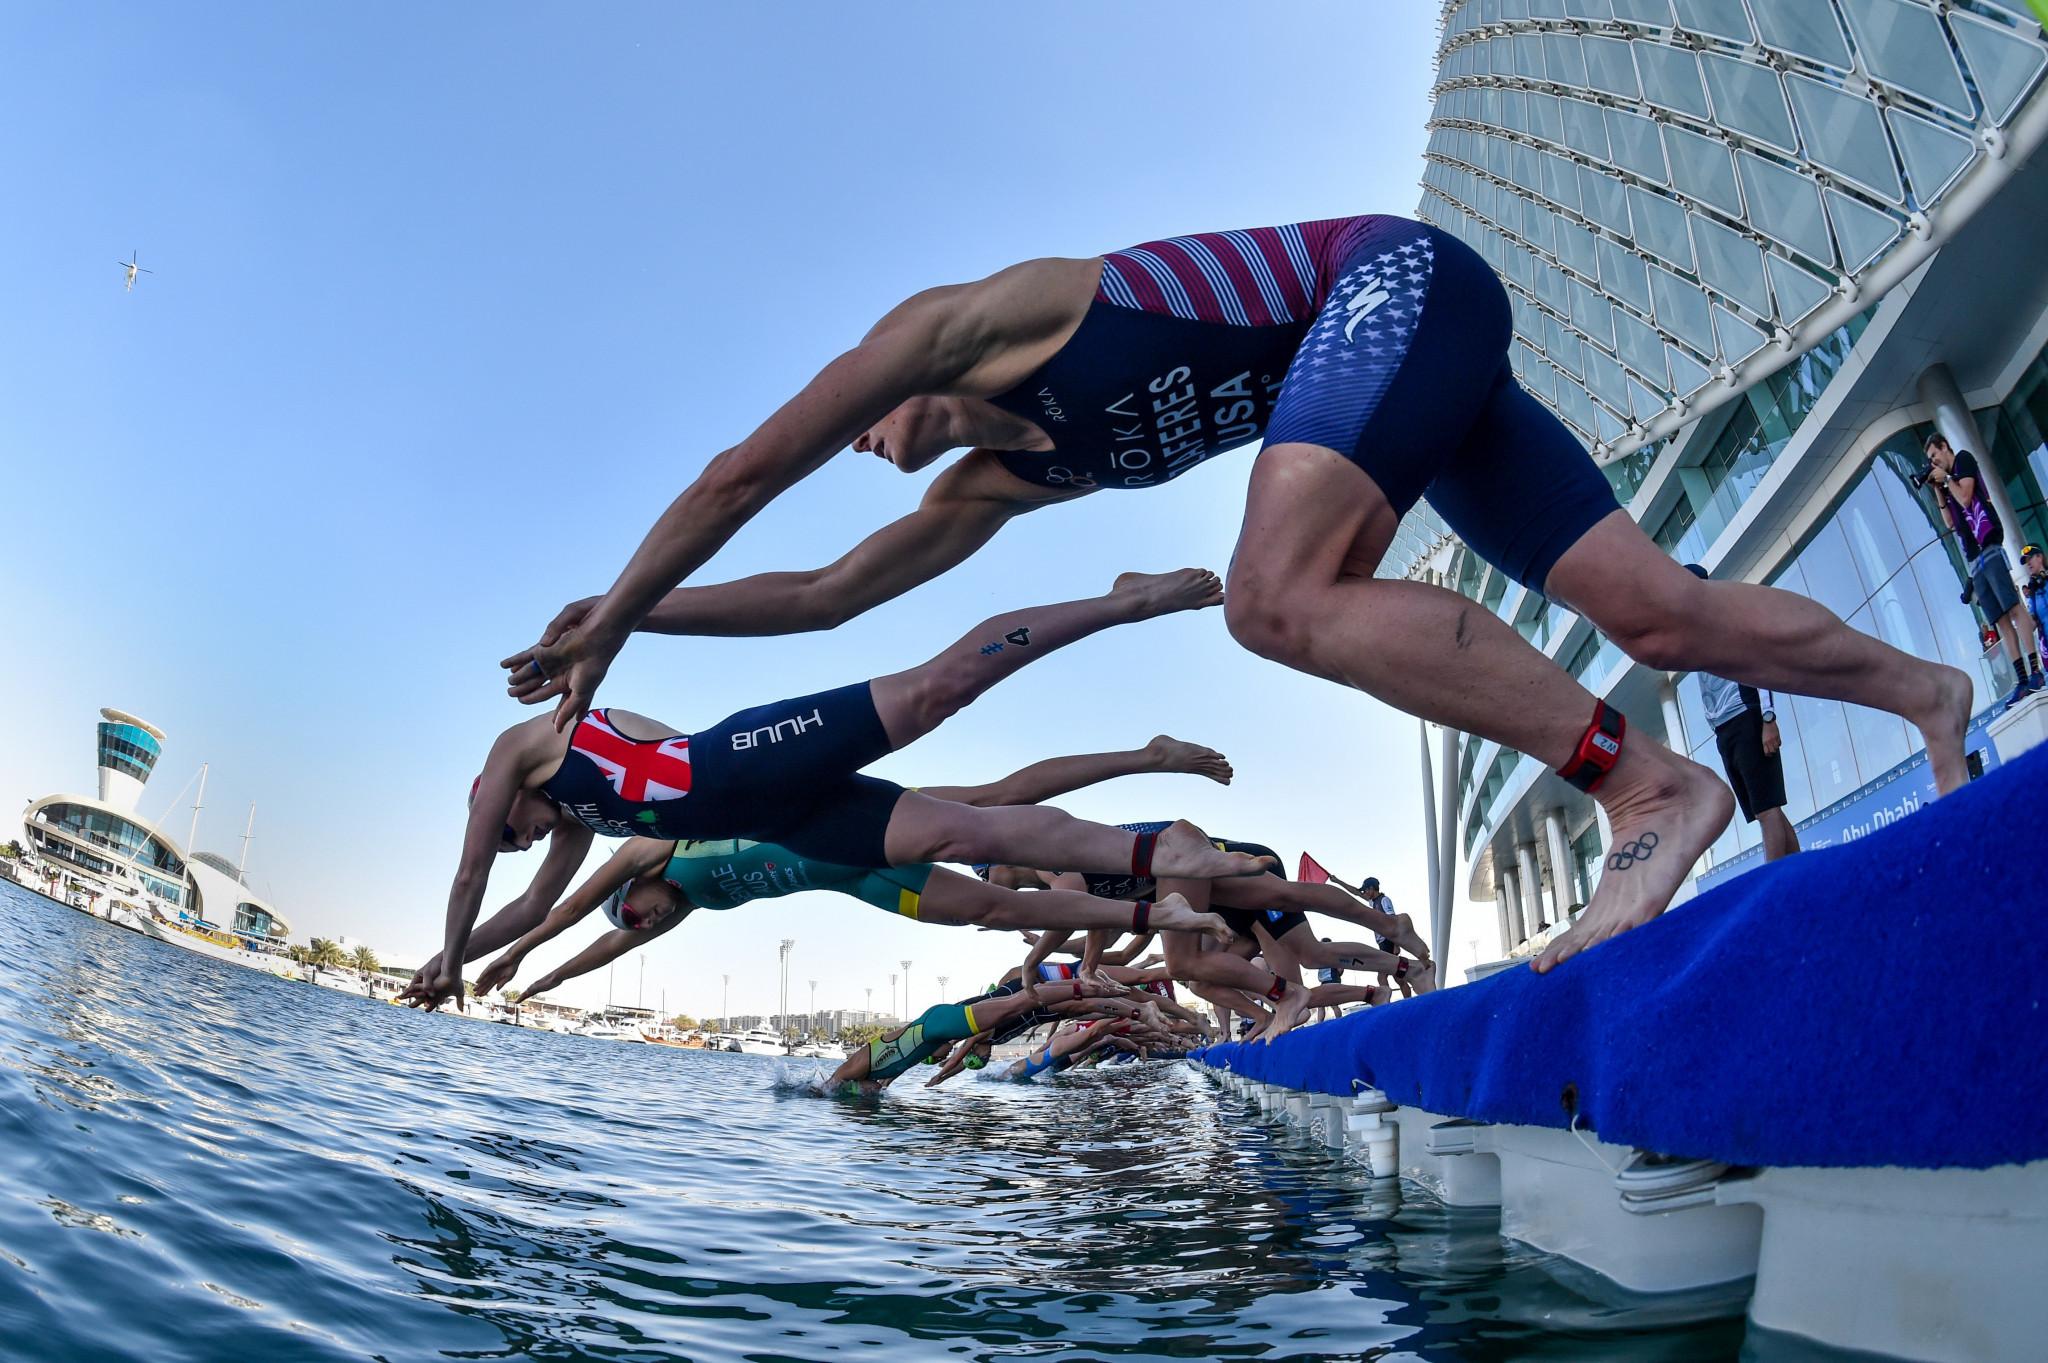 The World Triathlon Championships Series event in Abu Dhabi has been postponed to November ©World Triathlon